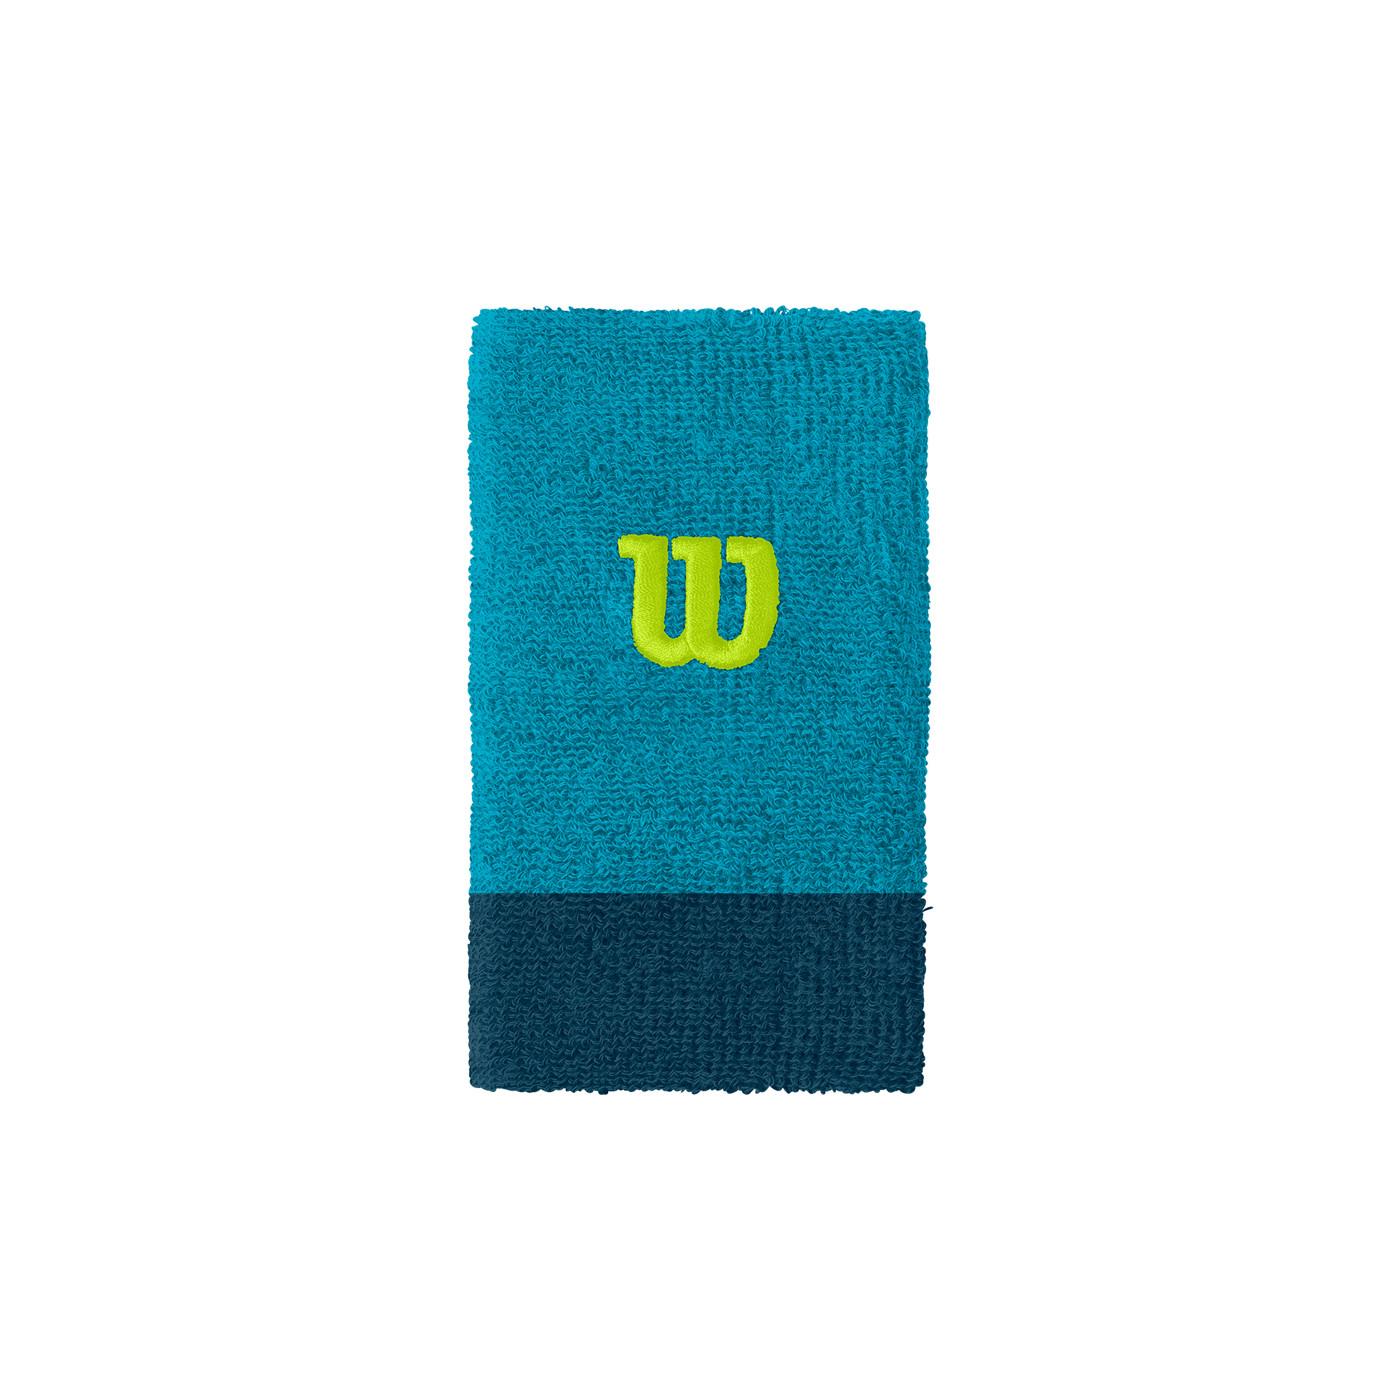 WILSON EXTRA WIDE W WRISTBAND Barr Reef/MA OSFA - Herren